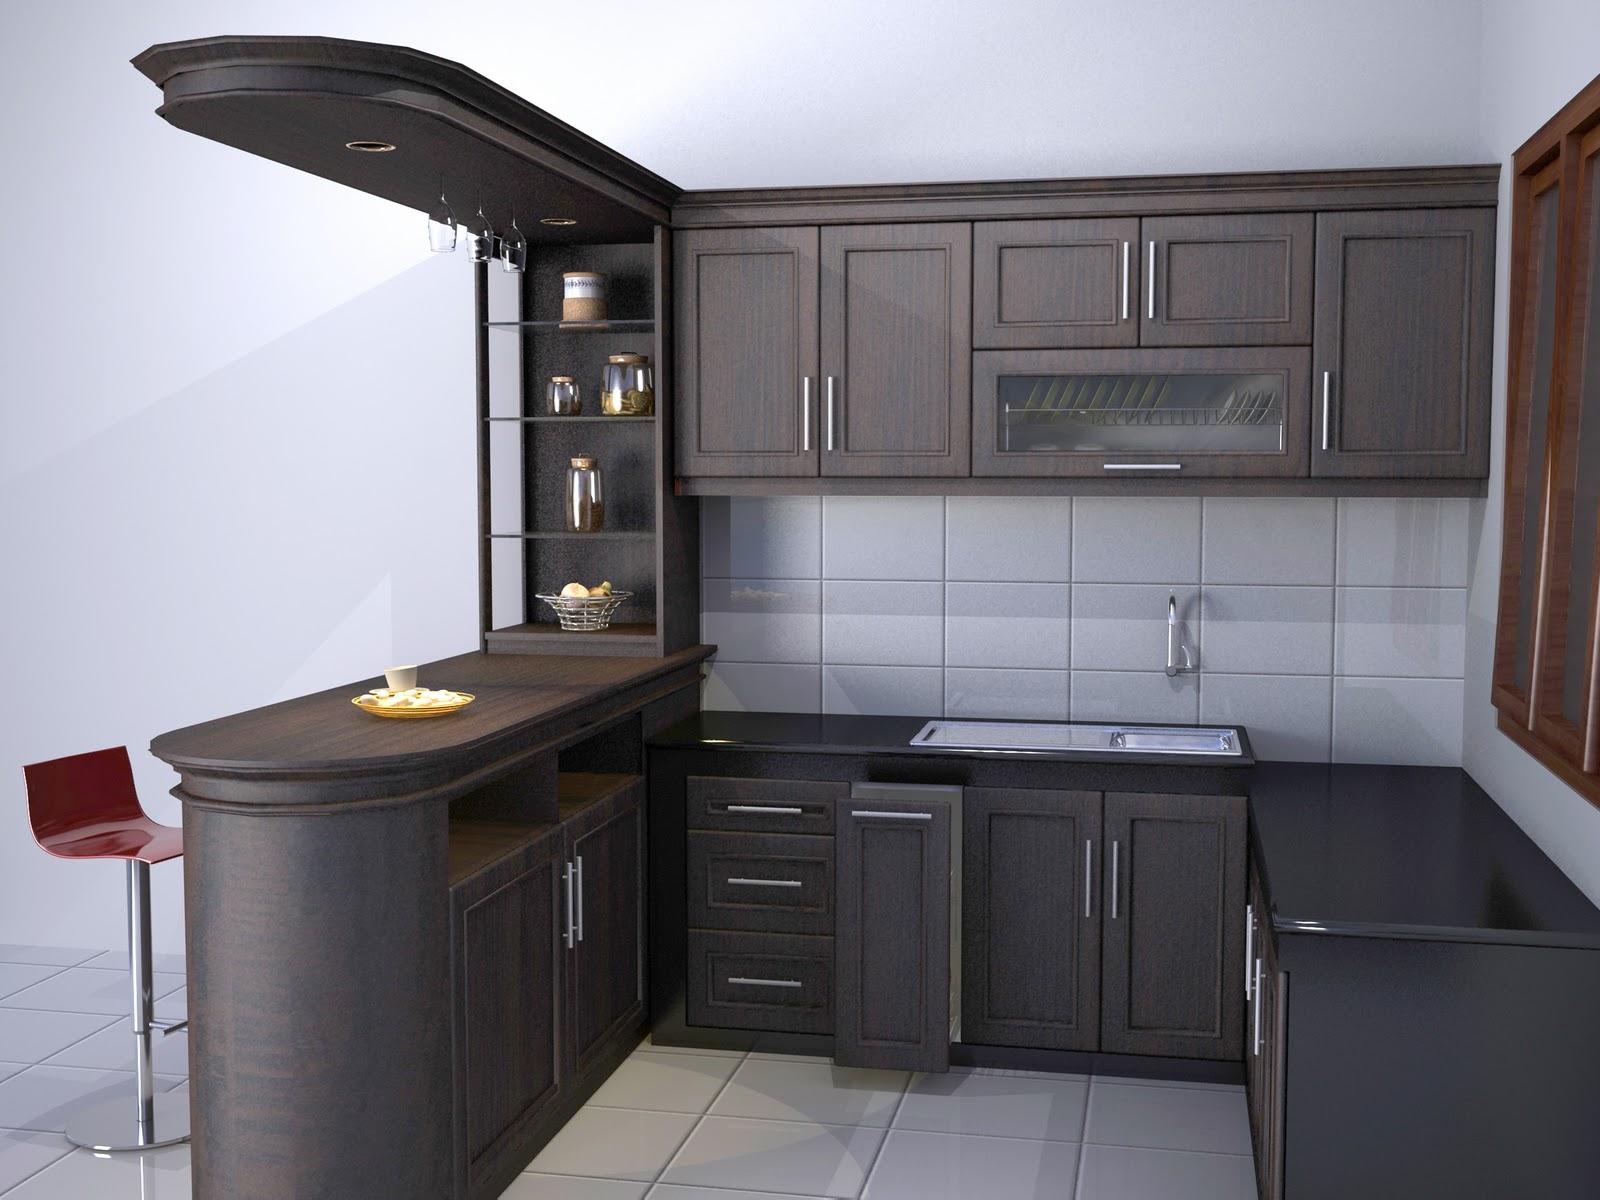 Jasa Pembuatan Kitchen Set Jakarta Paling Ahli dan Banyak Direkomendasikan